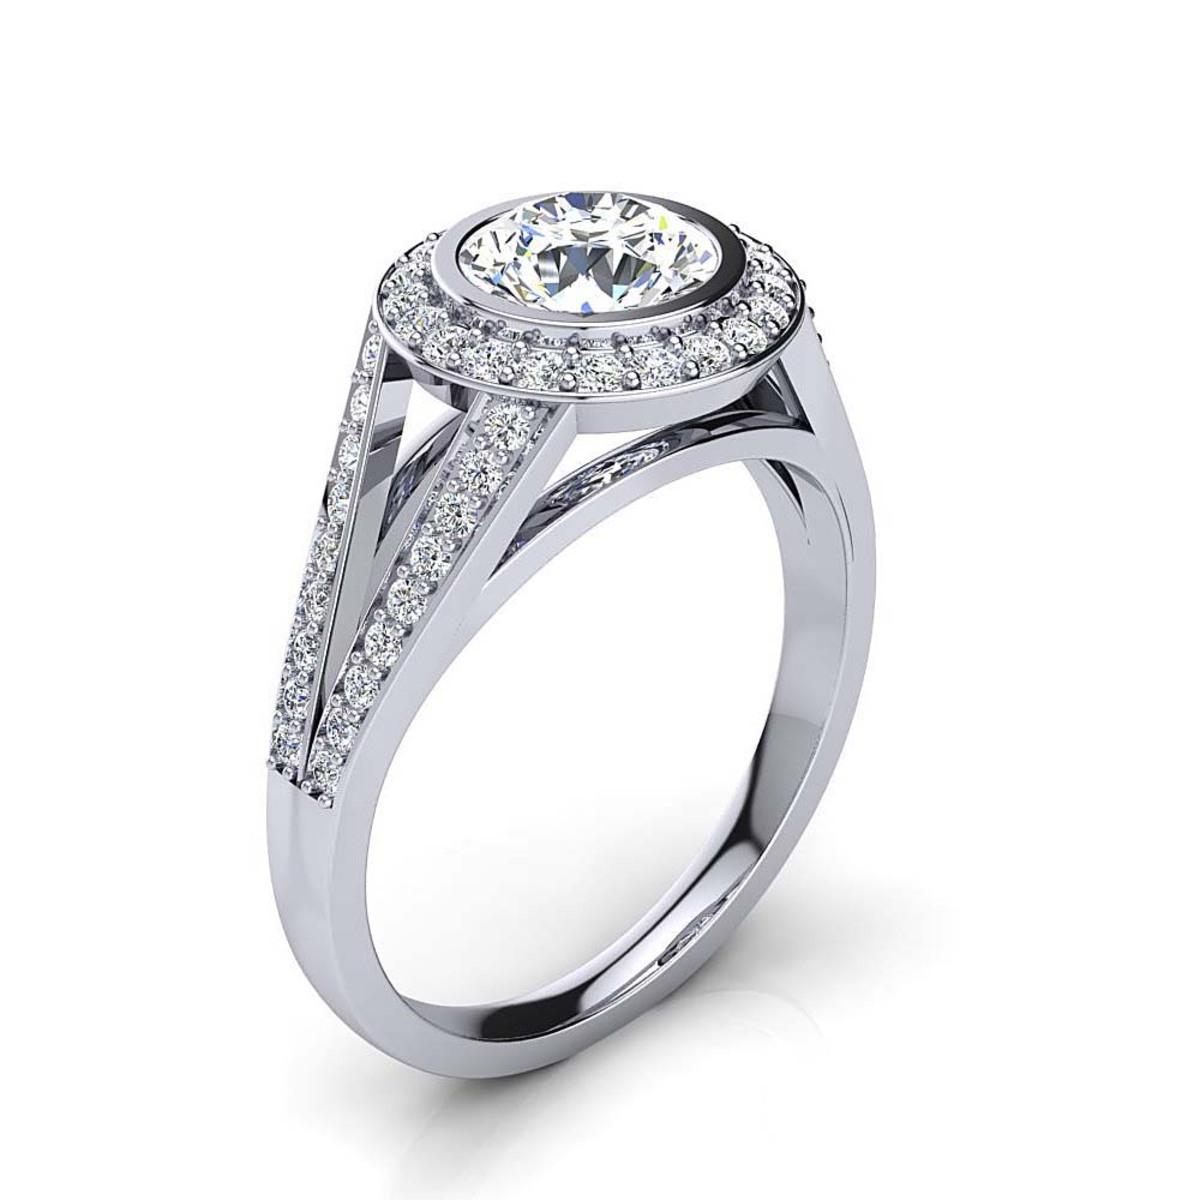 Unique Platinum Halo Diamond Engagement Ring by Luxurman 1.35ct